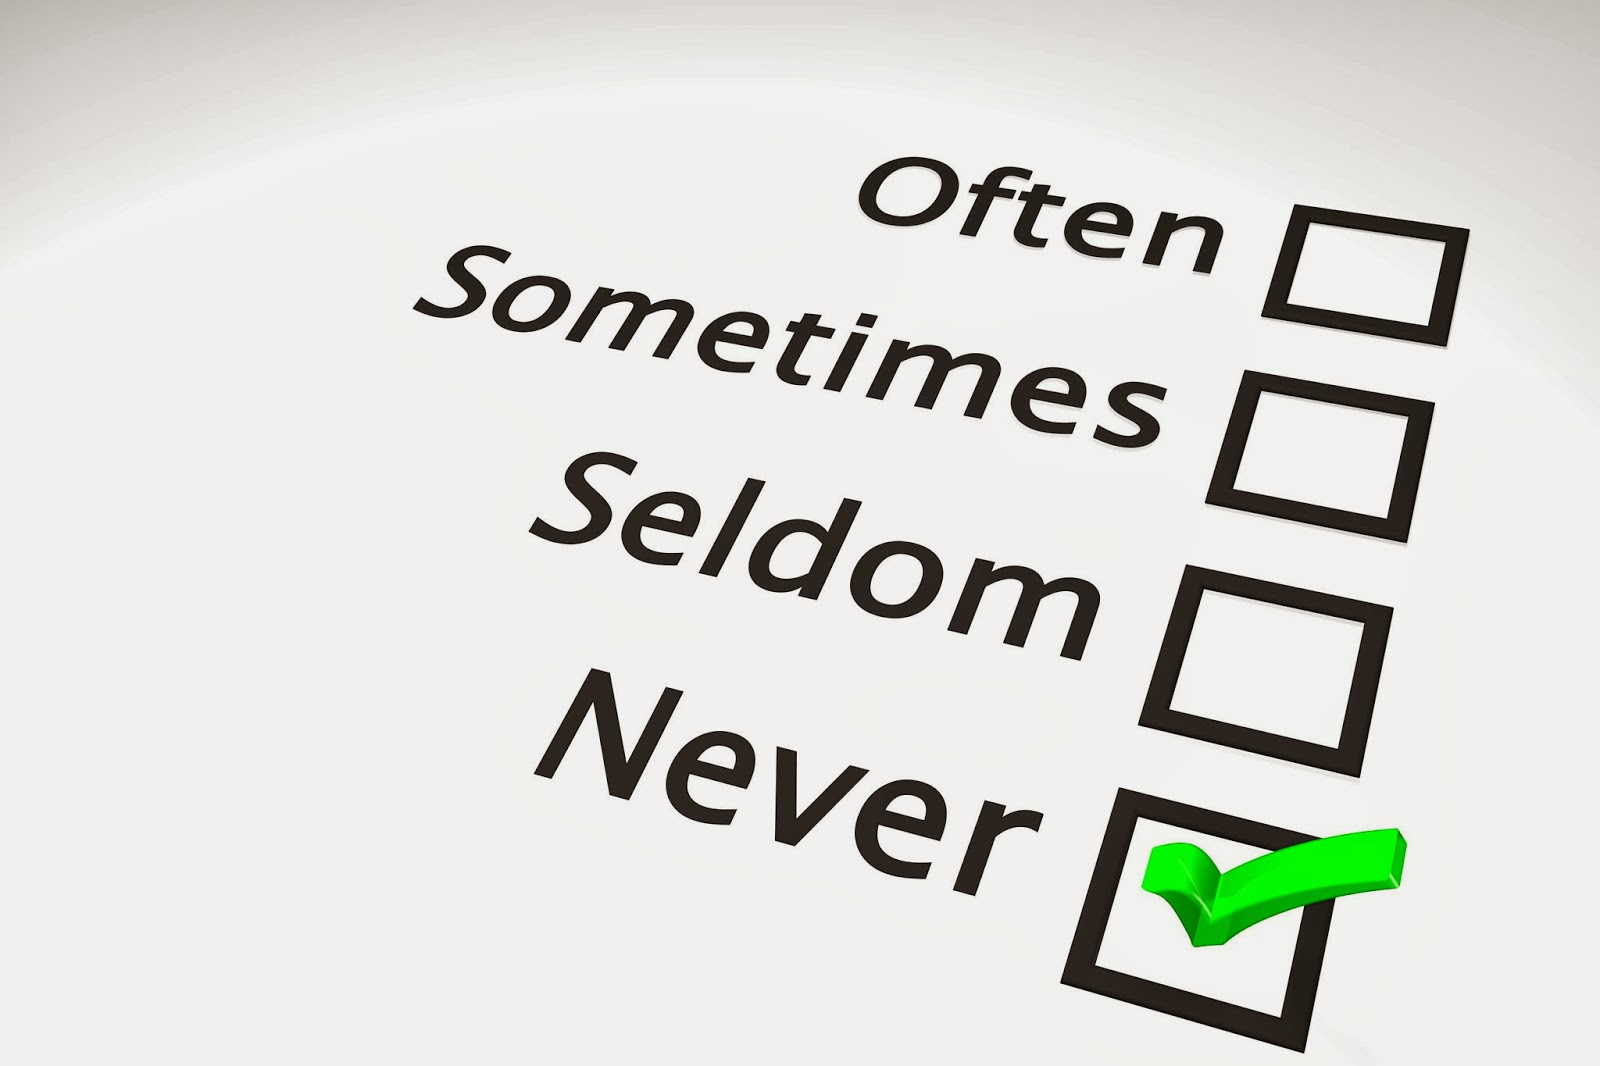 http://freebsfreak.blogspot.com/2013/09/why-i-think-surveys-are-worth-it.html